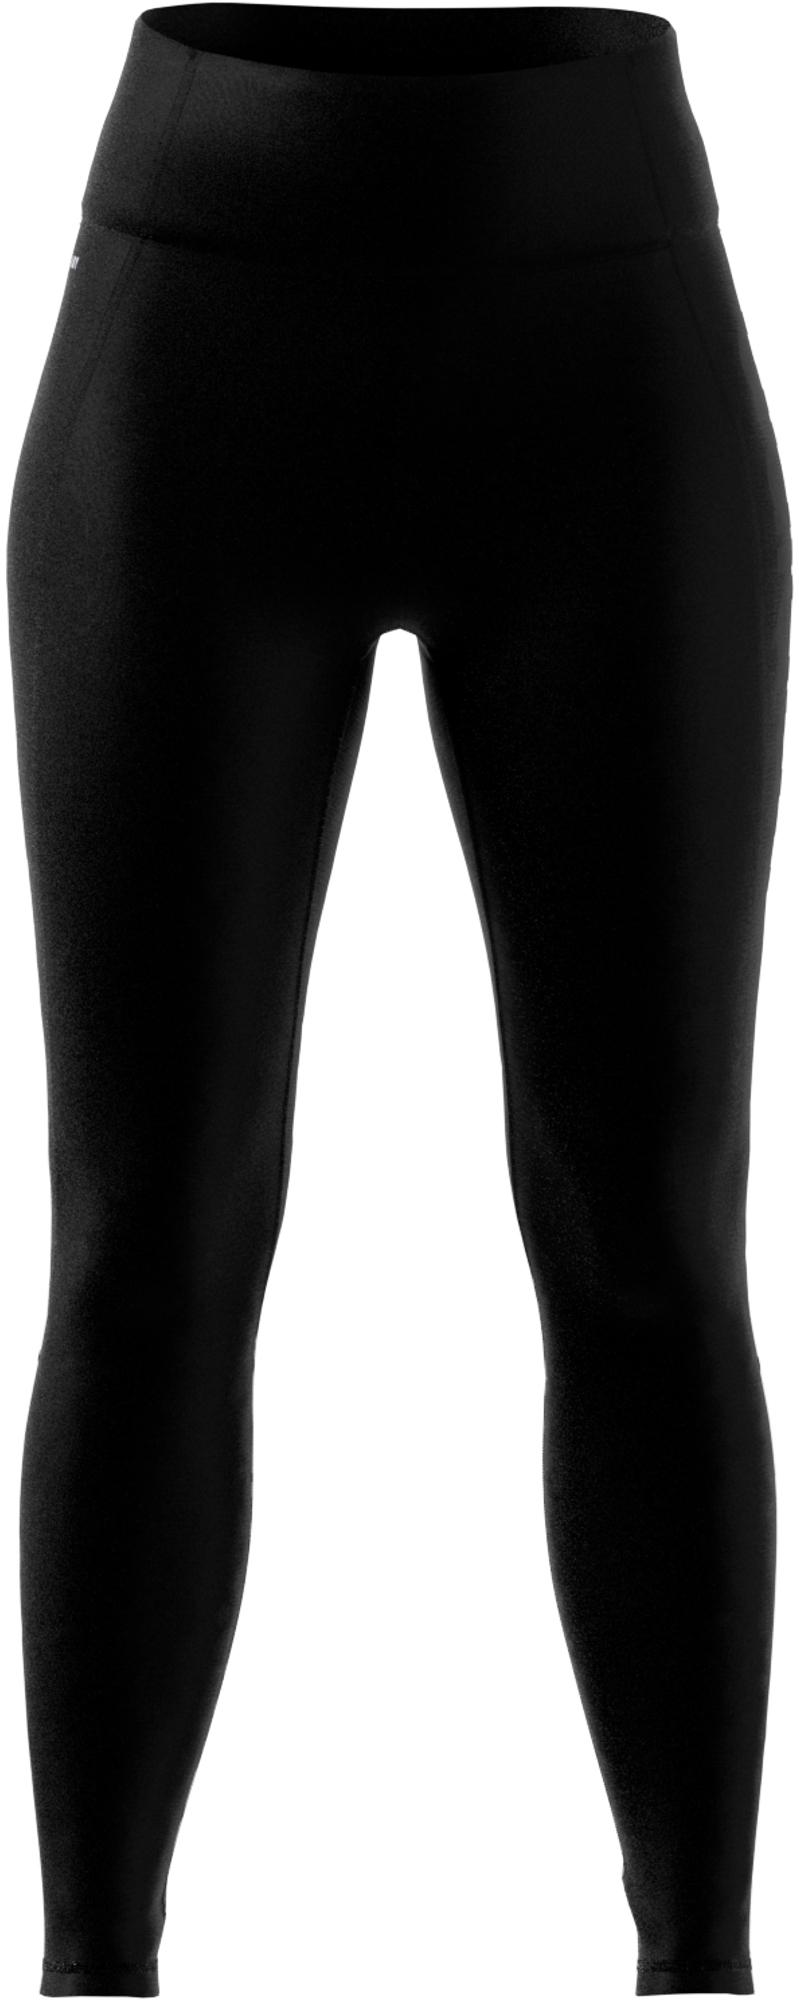 Adidas Легинсы женские adidas Design 2 Move Logo, размер 38-40 тайтсы женские adidas how we do tight цвет серый dp3958 размер xs 40 42